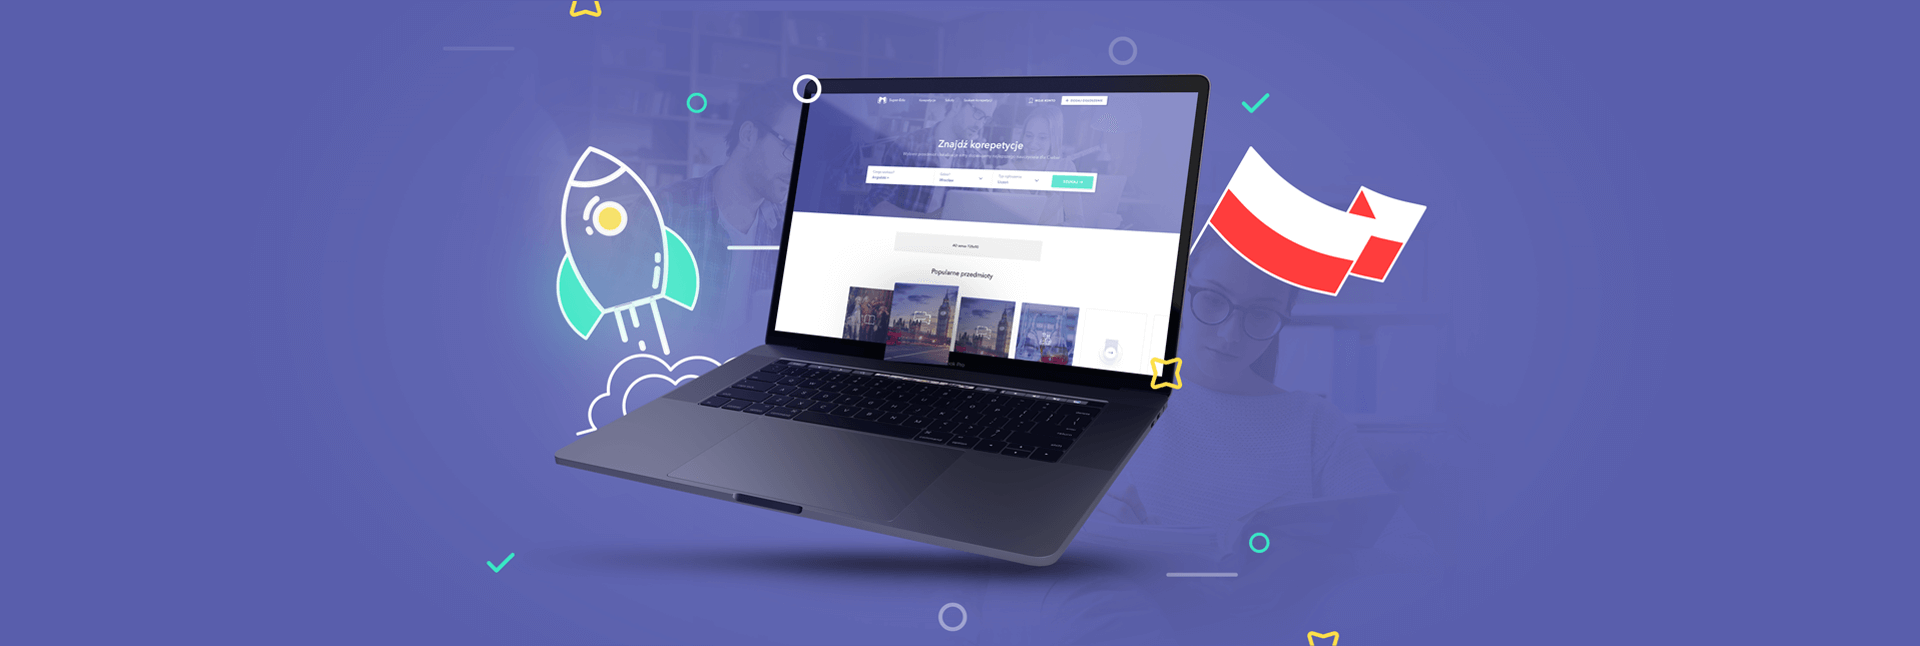 portal korepetycji super-edu.pl